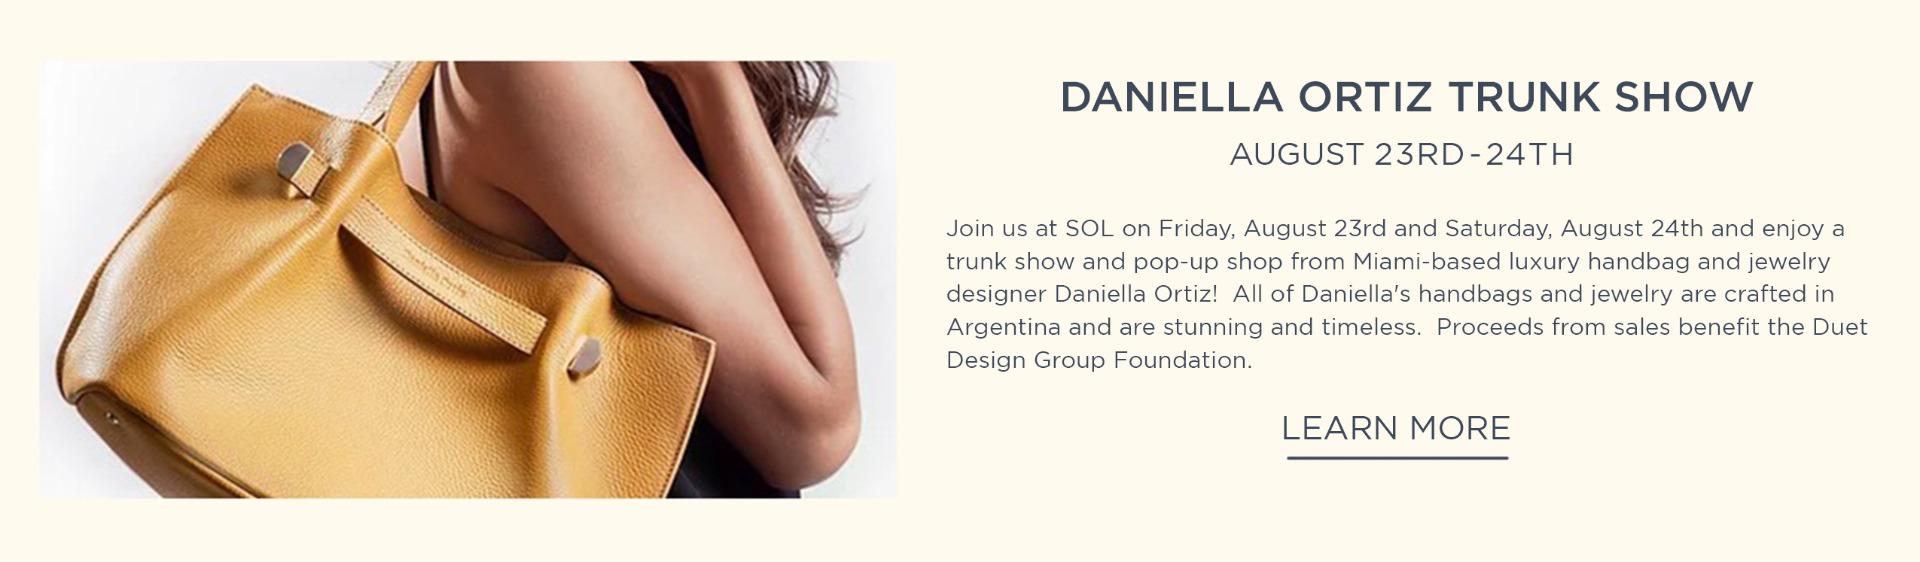 Daniella Ortiz Trunk Show